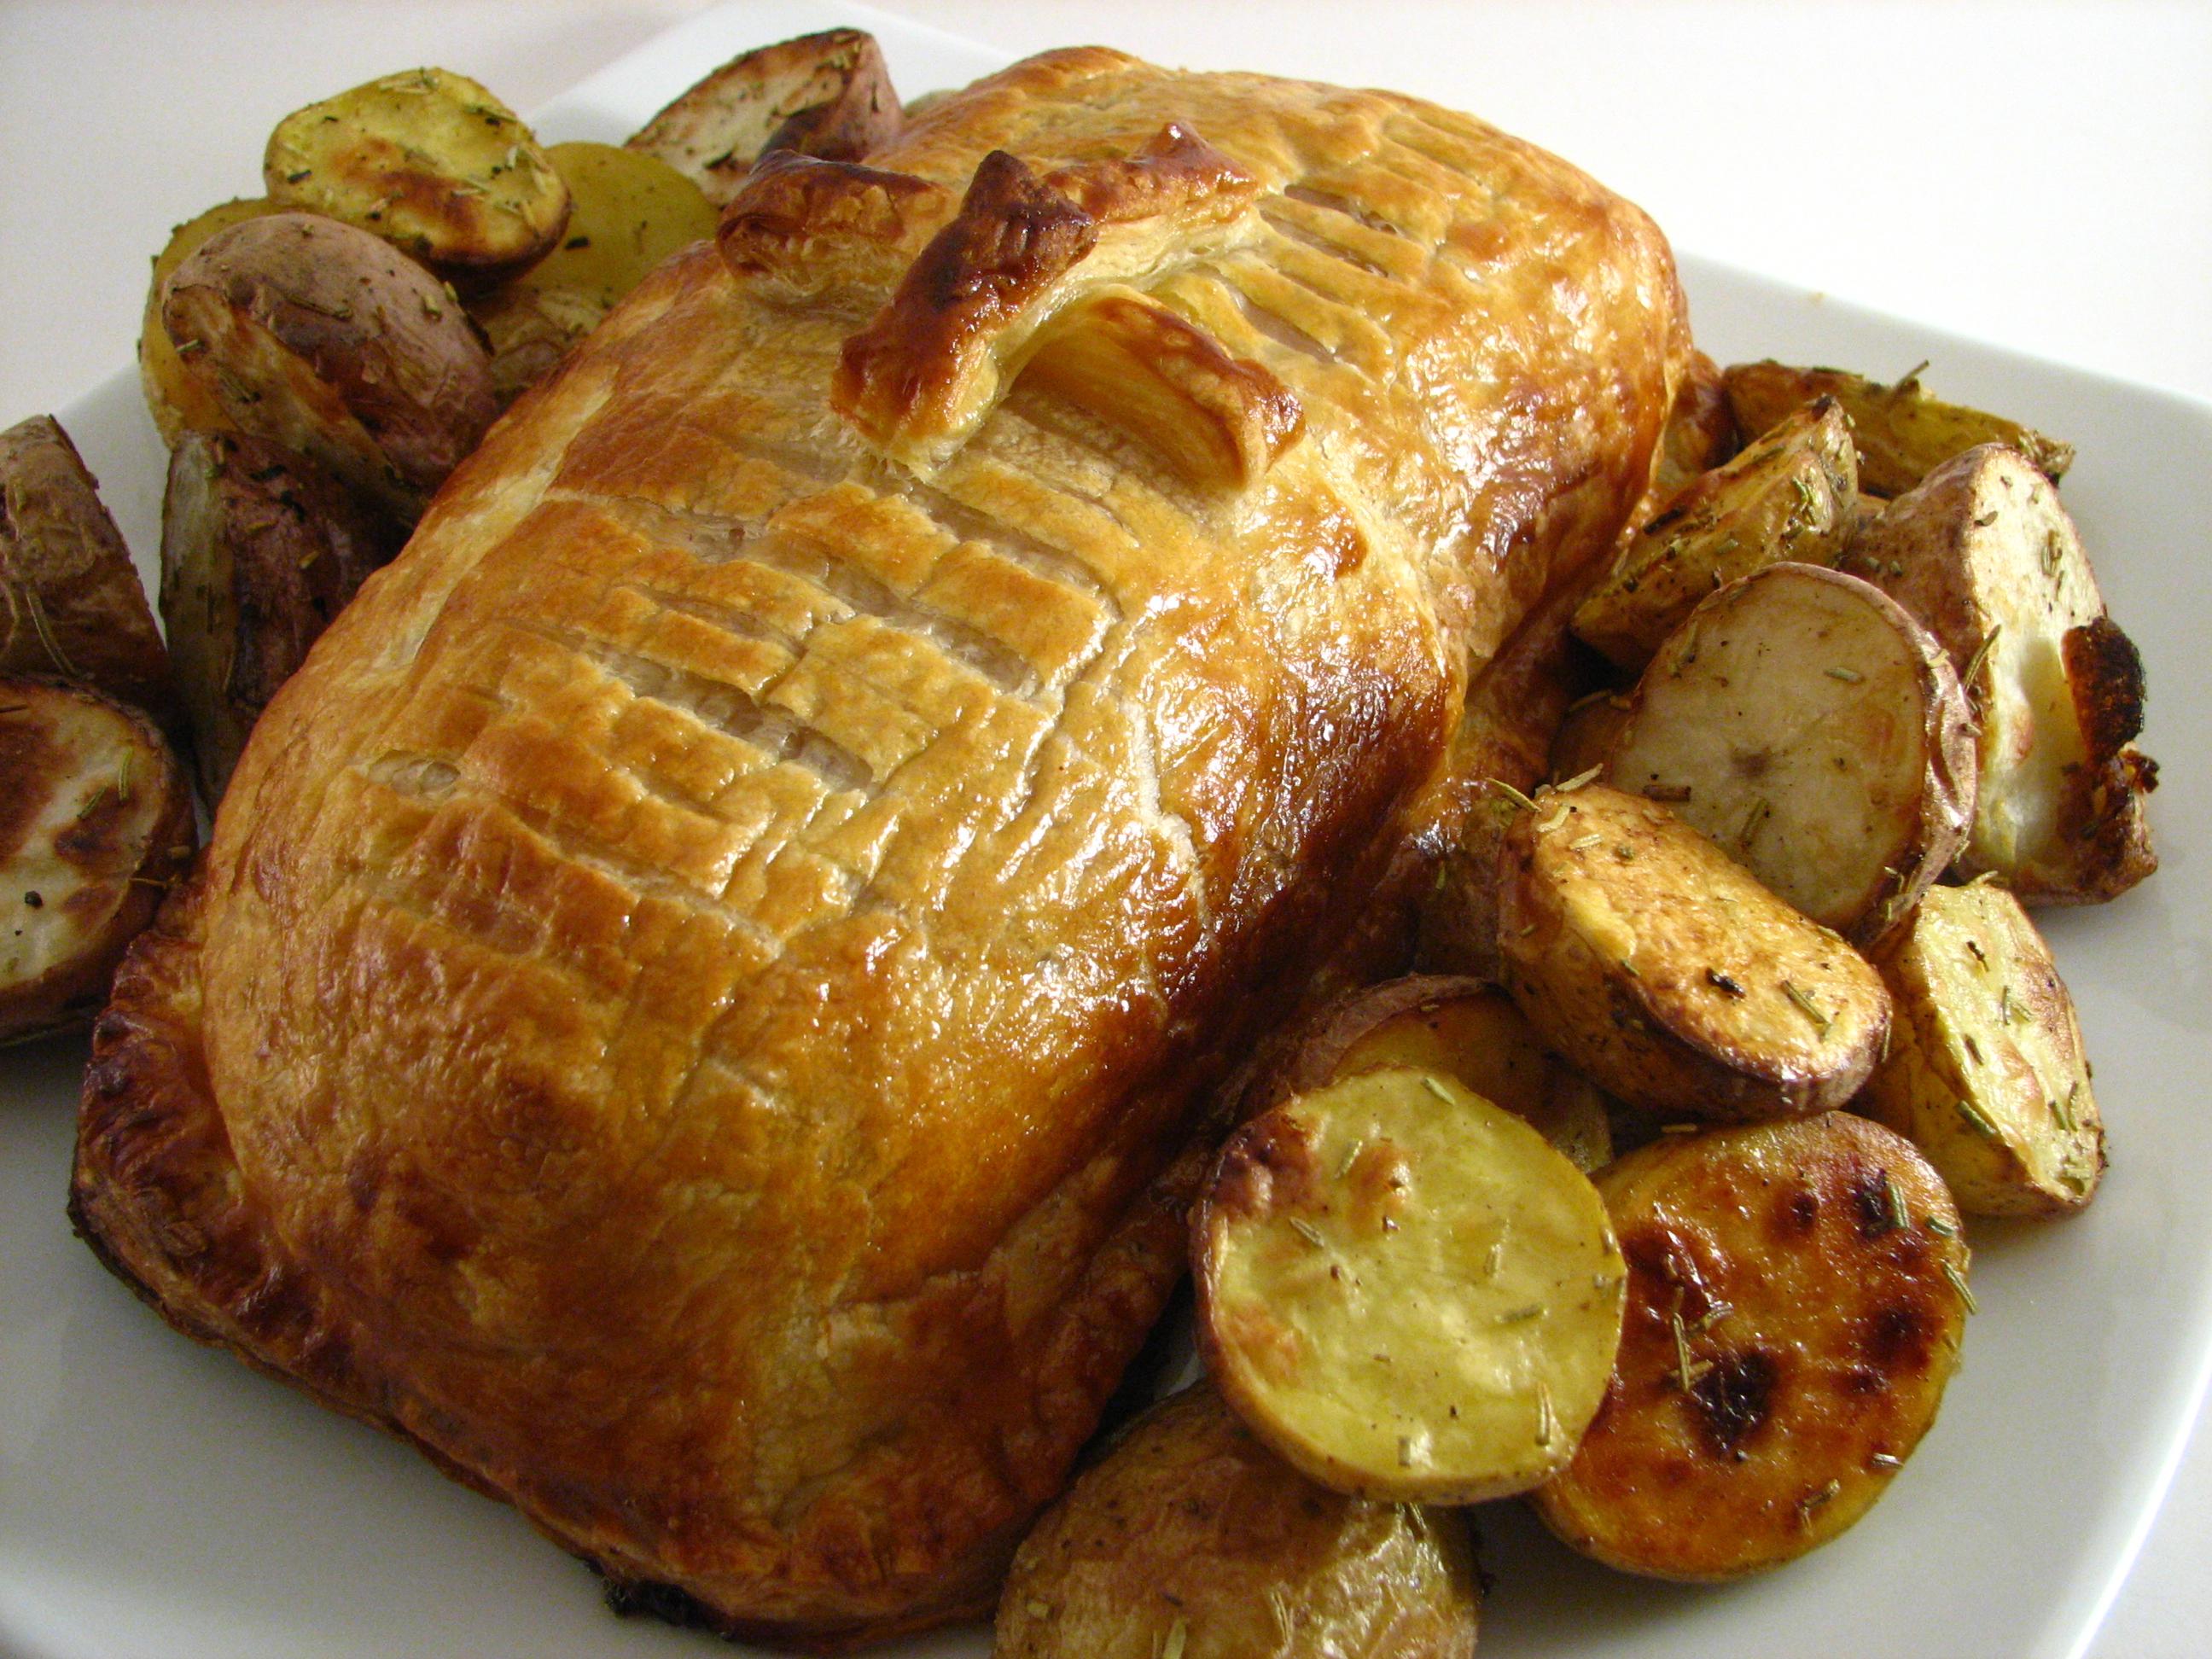 File:Beef Wellington - Whole.jpg - Wikimedia Commons